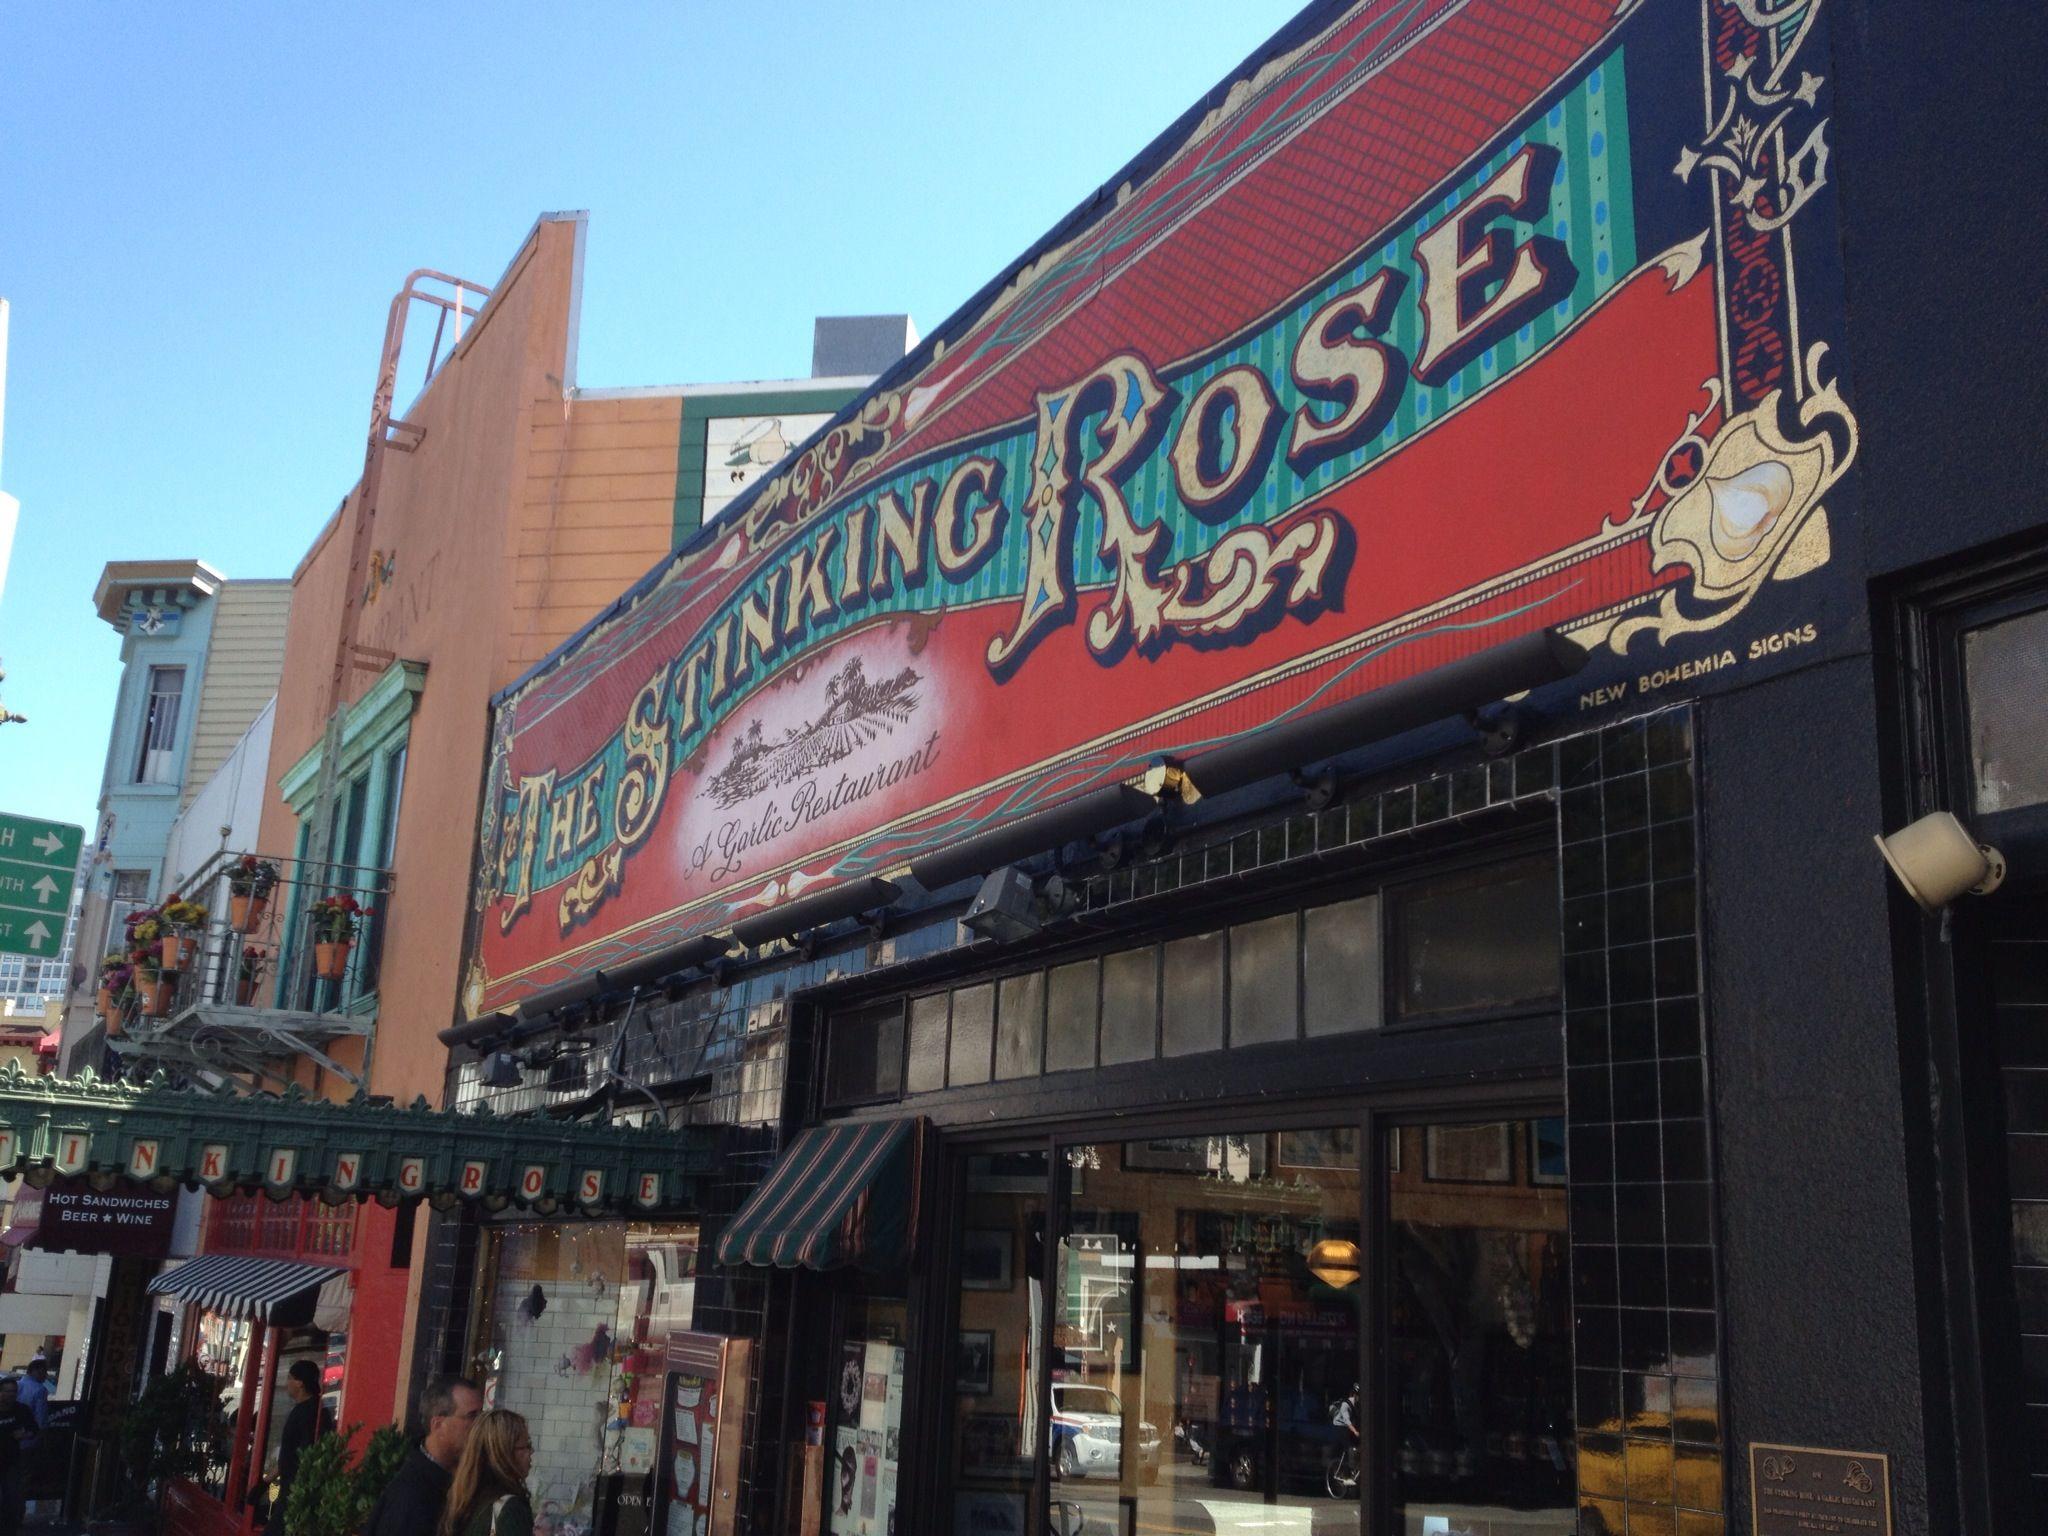 The Stinking Rose - San Francisco Fantastic food!